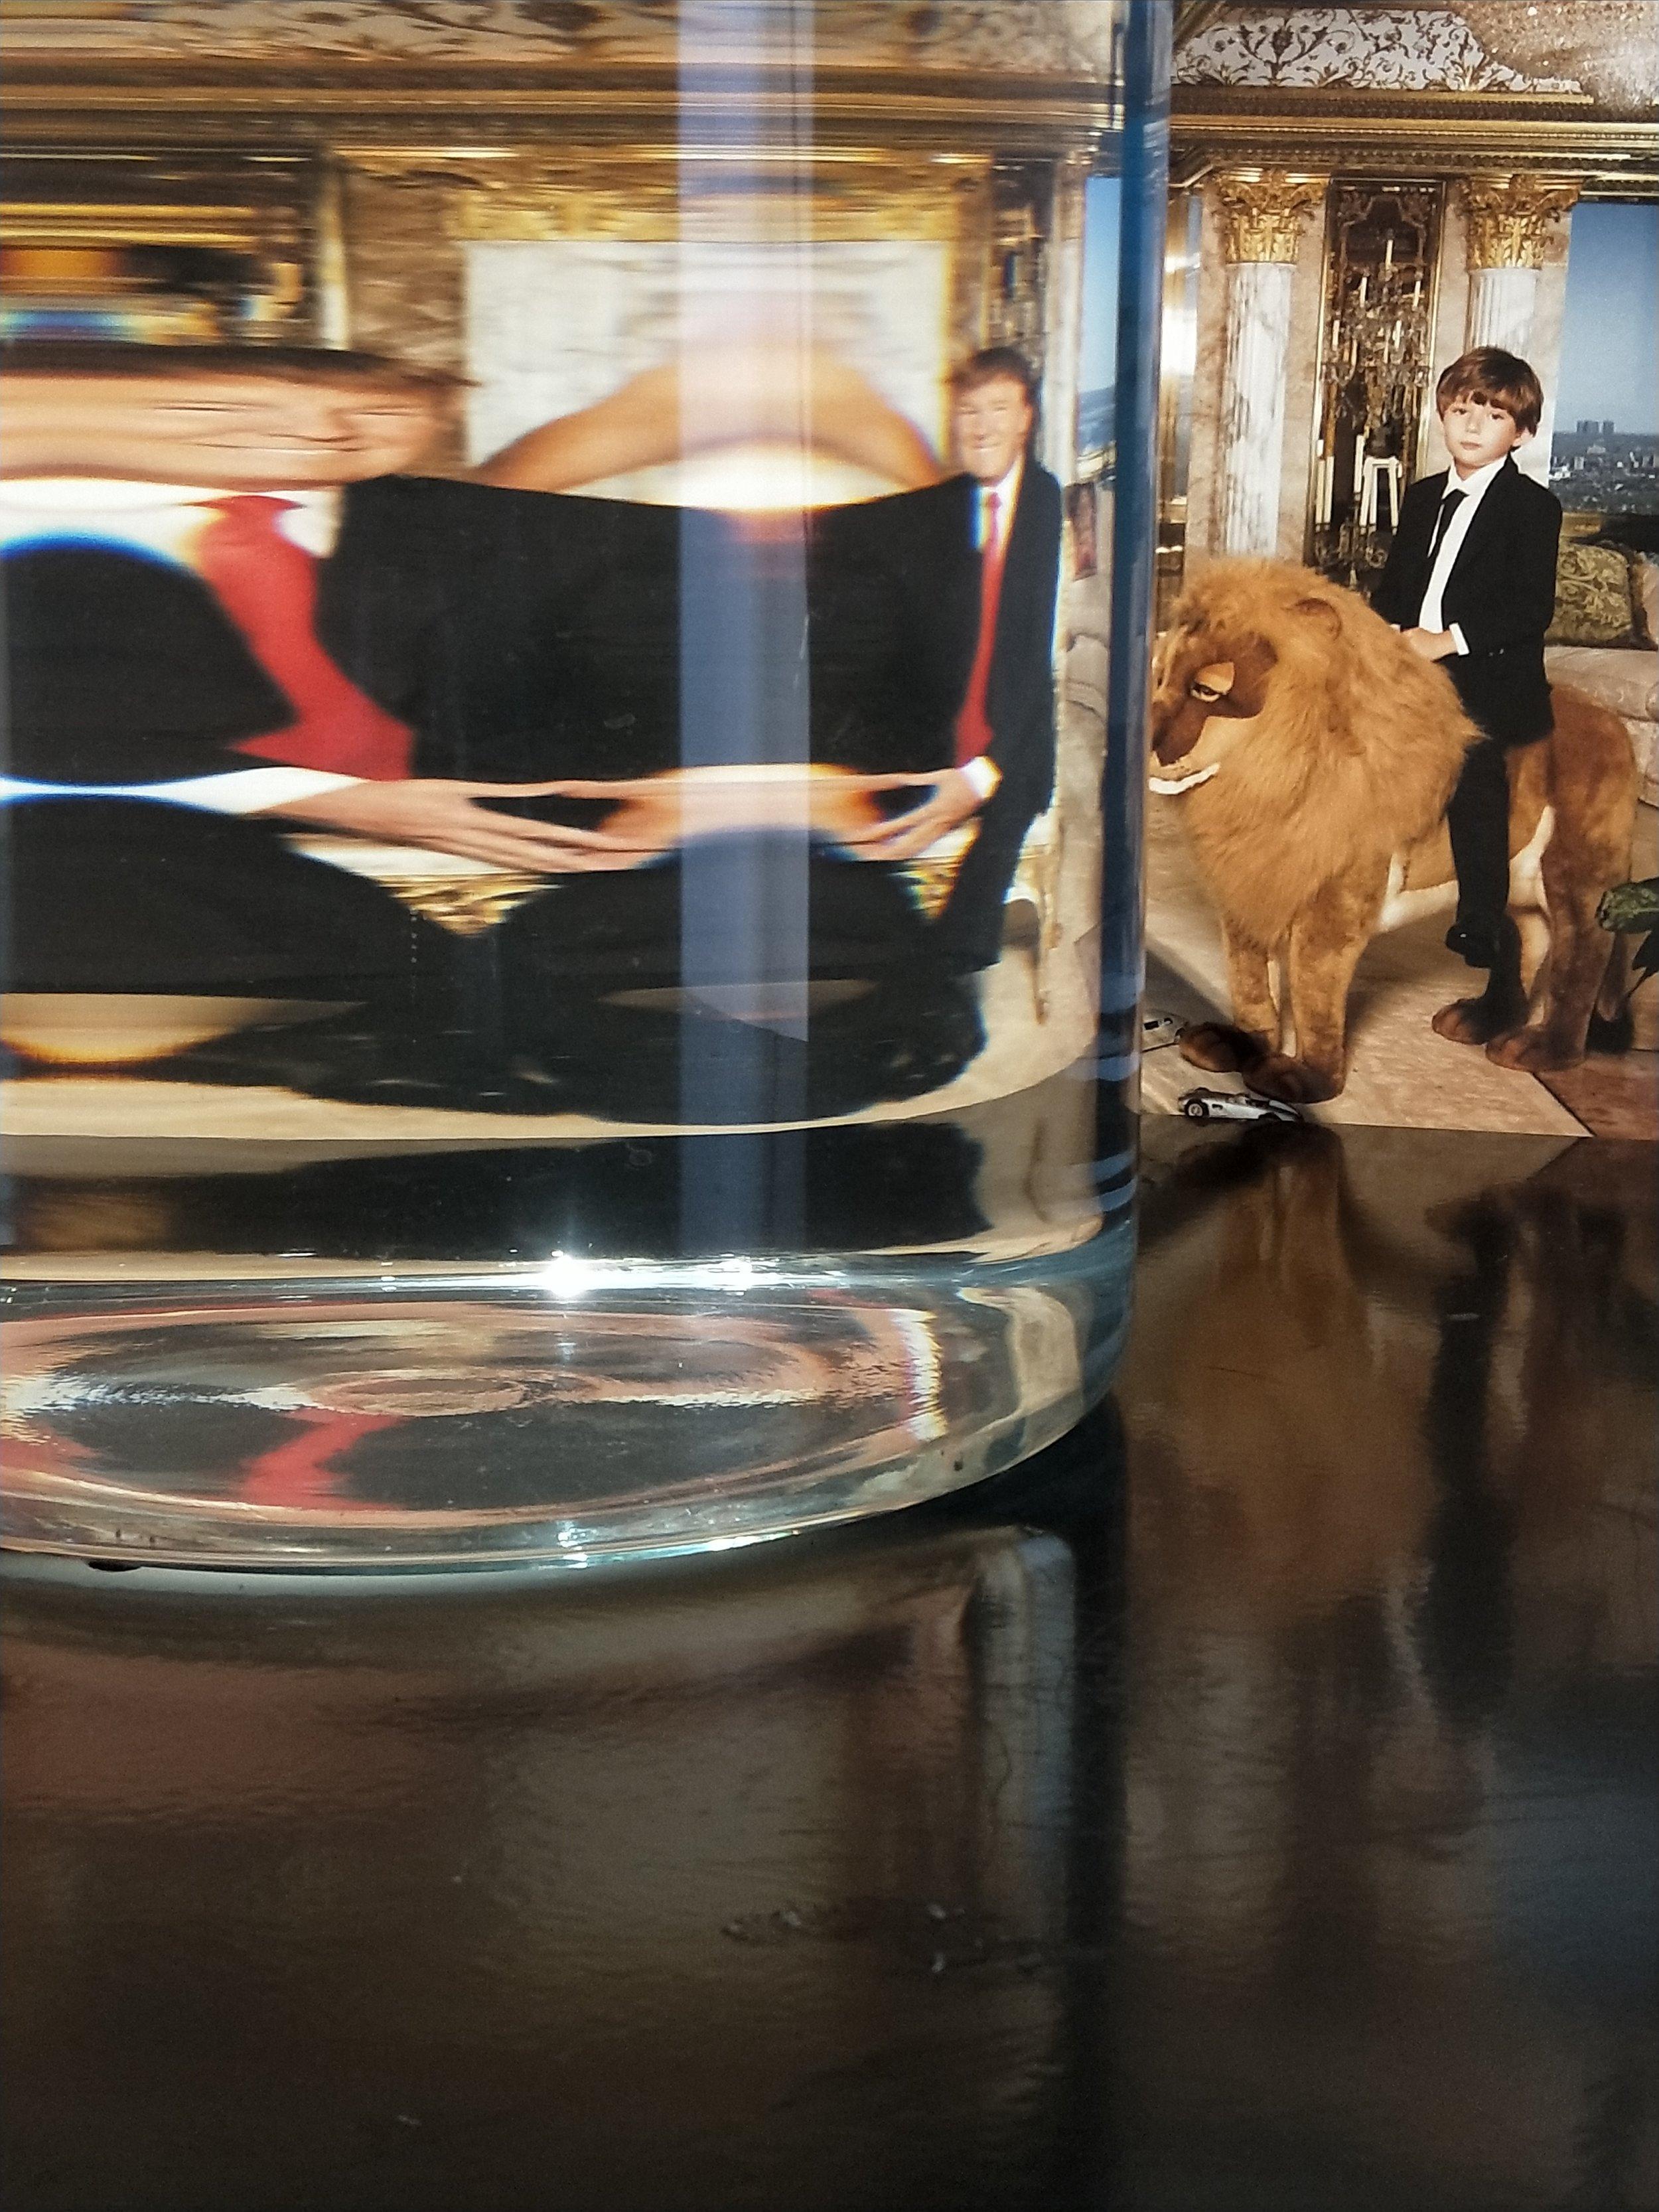 Refractive Errors: Trump's Family google image  2017, paint, steel, inkjet photograph on Museo Rag, google location  http://staging.snopes.com/app/uploads/2016/08/trump-family-portrait.jpg , water, glass vessel, light, 67cm x 45cm x 140mcm.